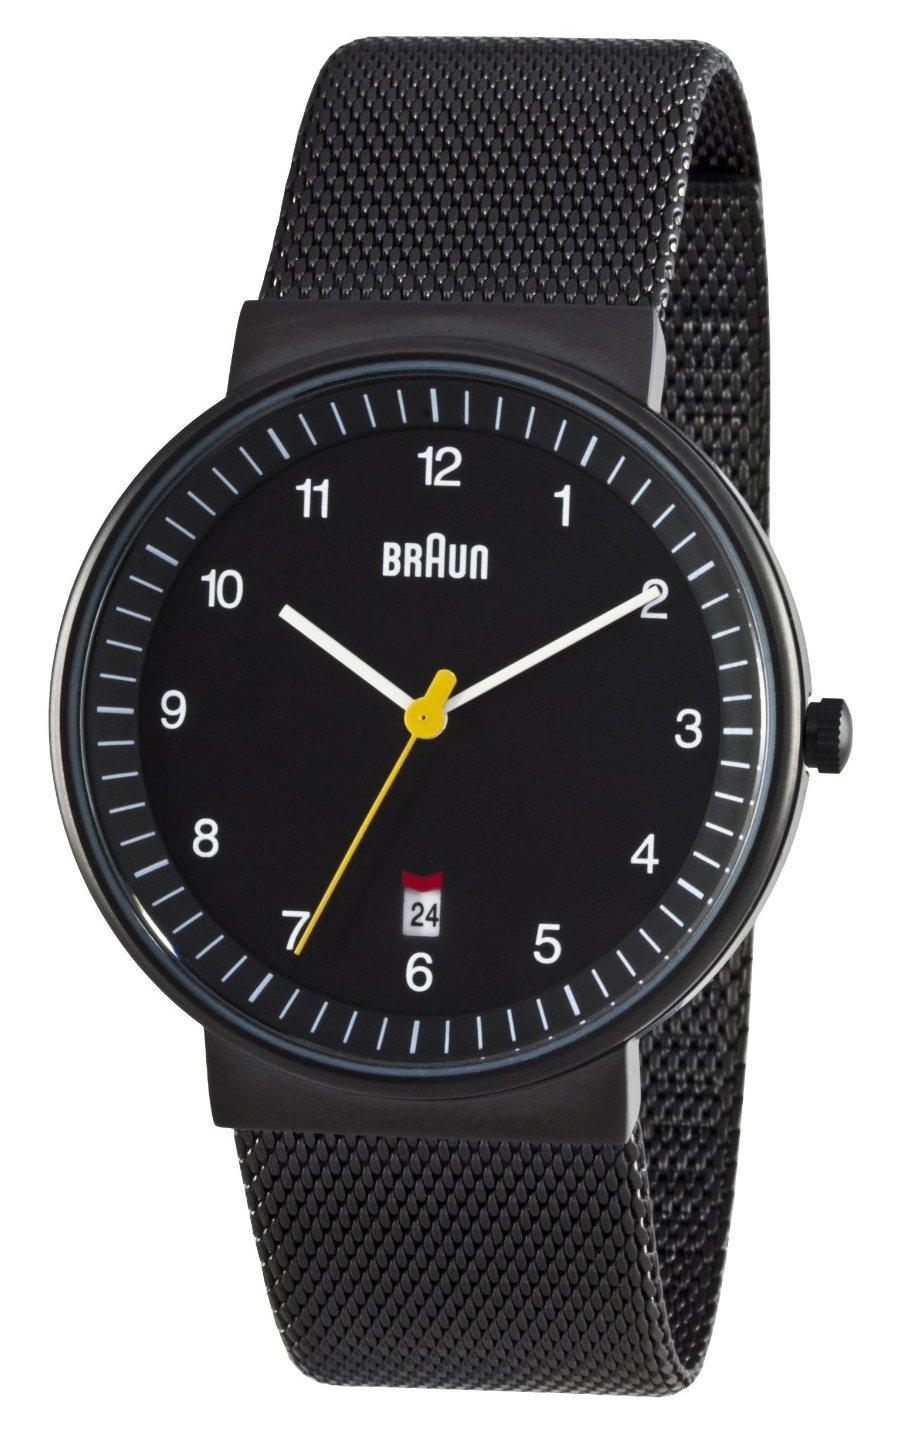 Braun Men's Analog Wrist Watch - camkb